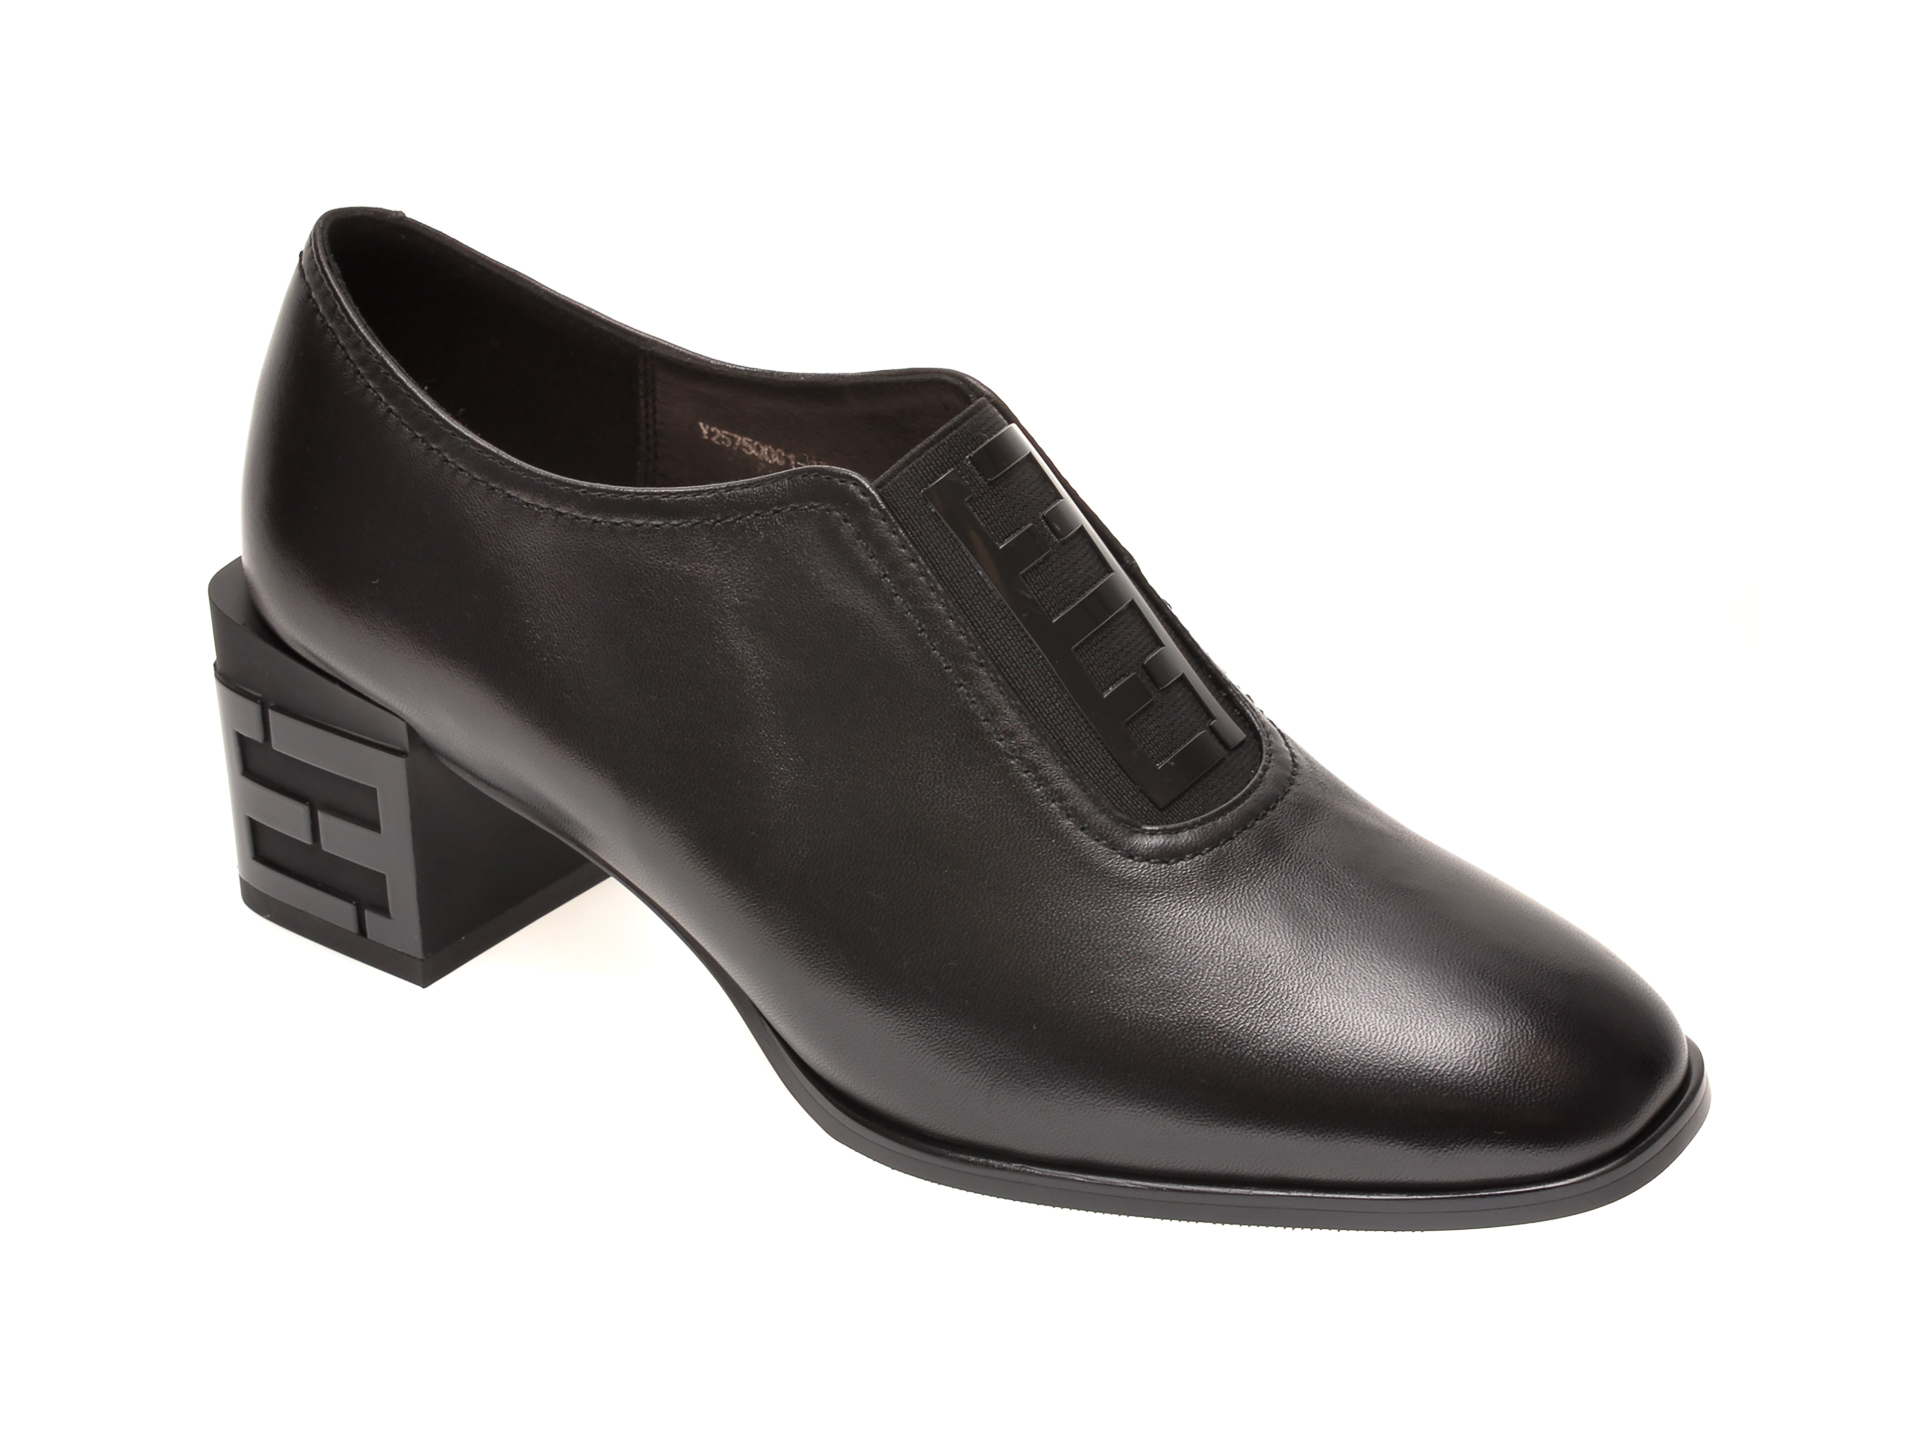 Pantofi EPICA negri, Y2575Q0, din piele naturala